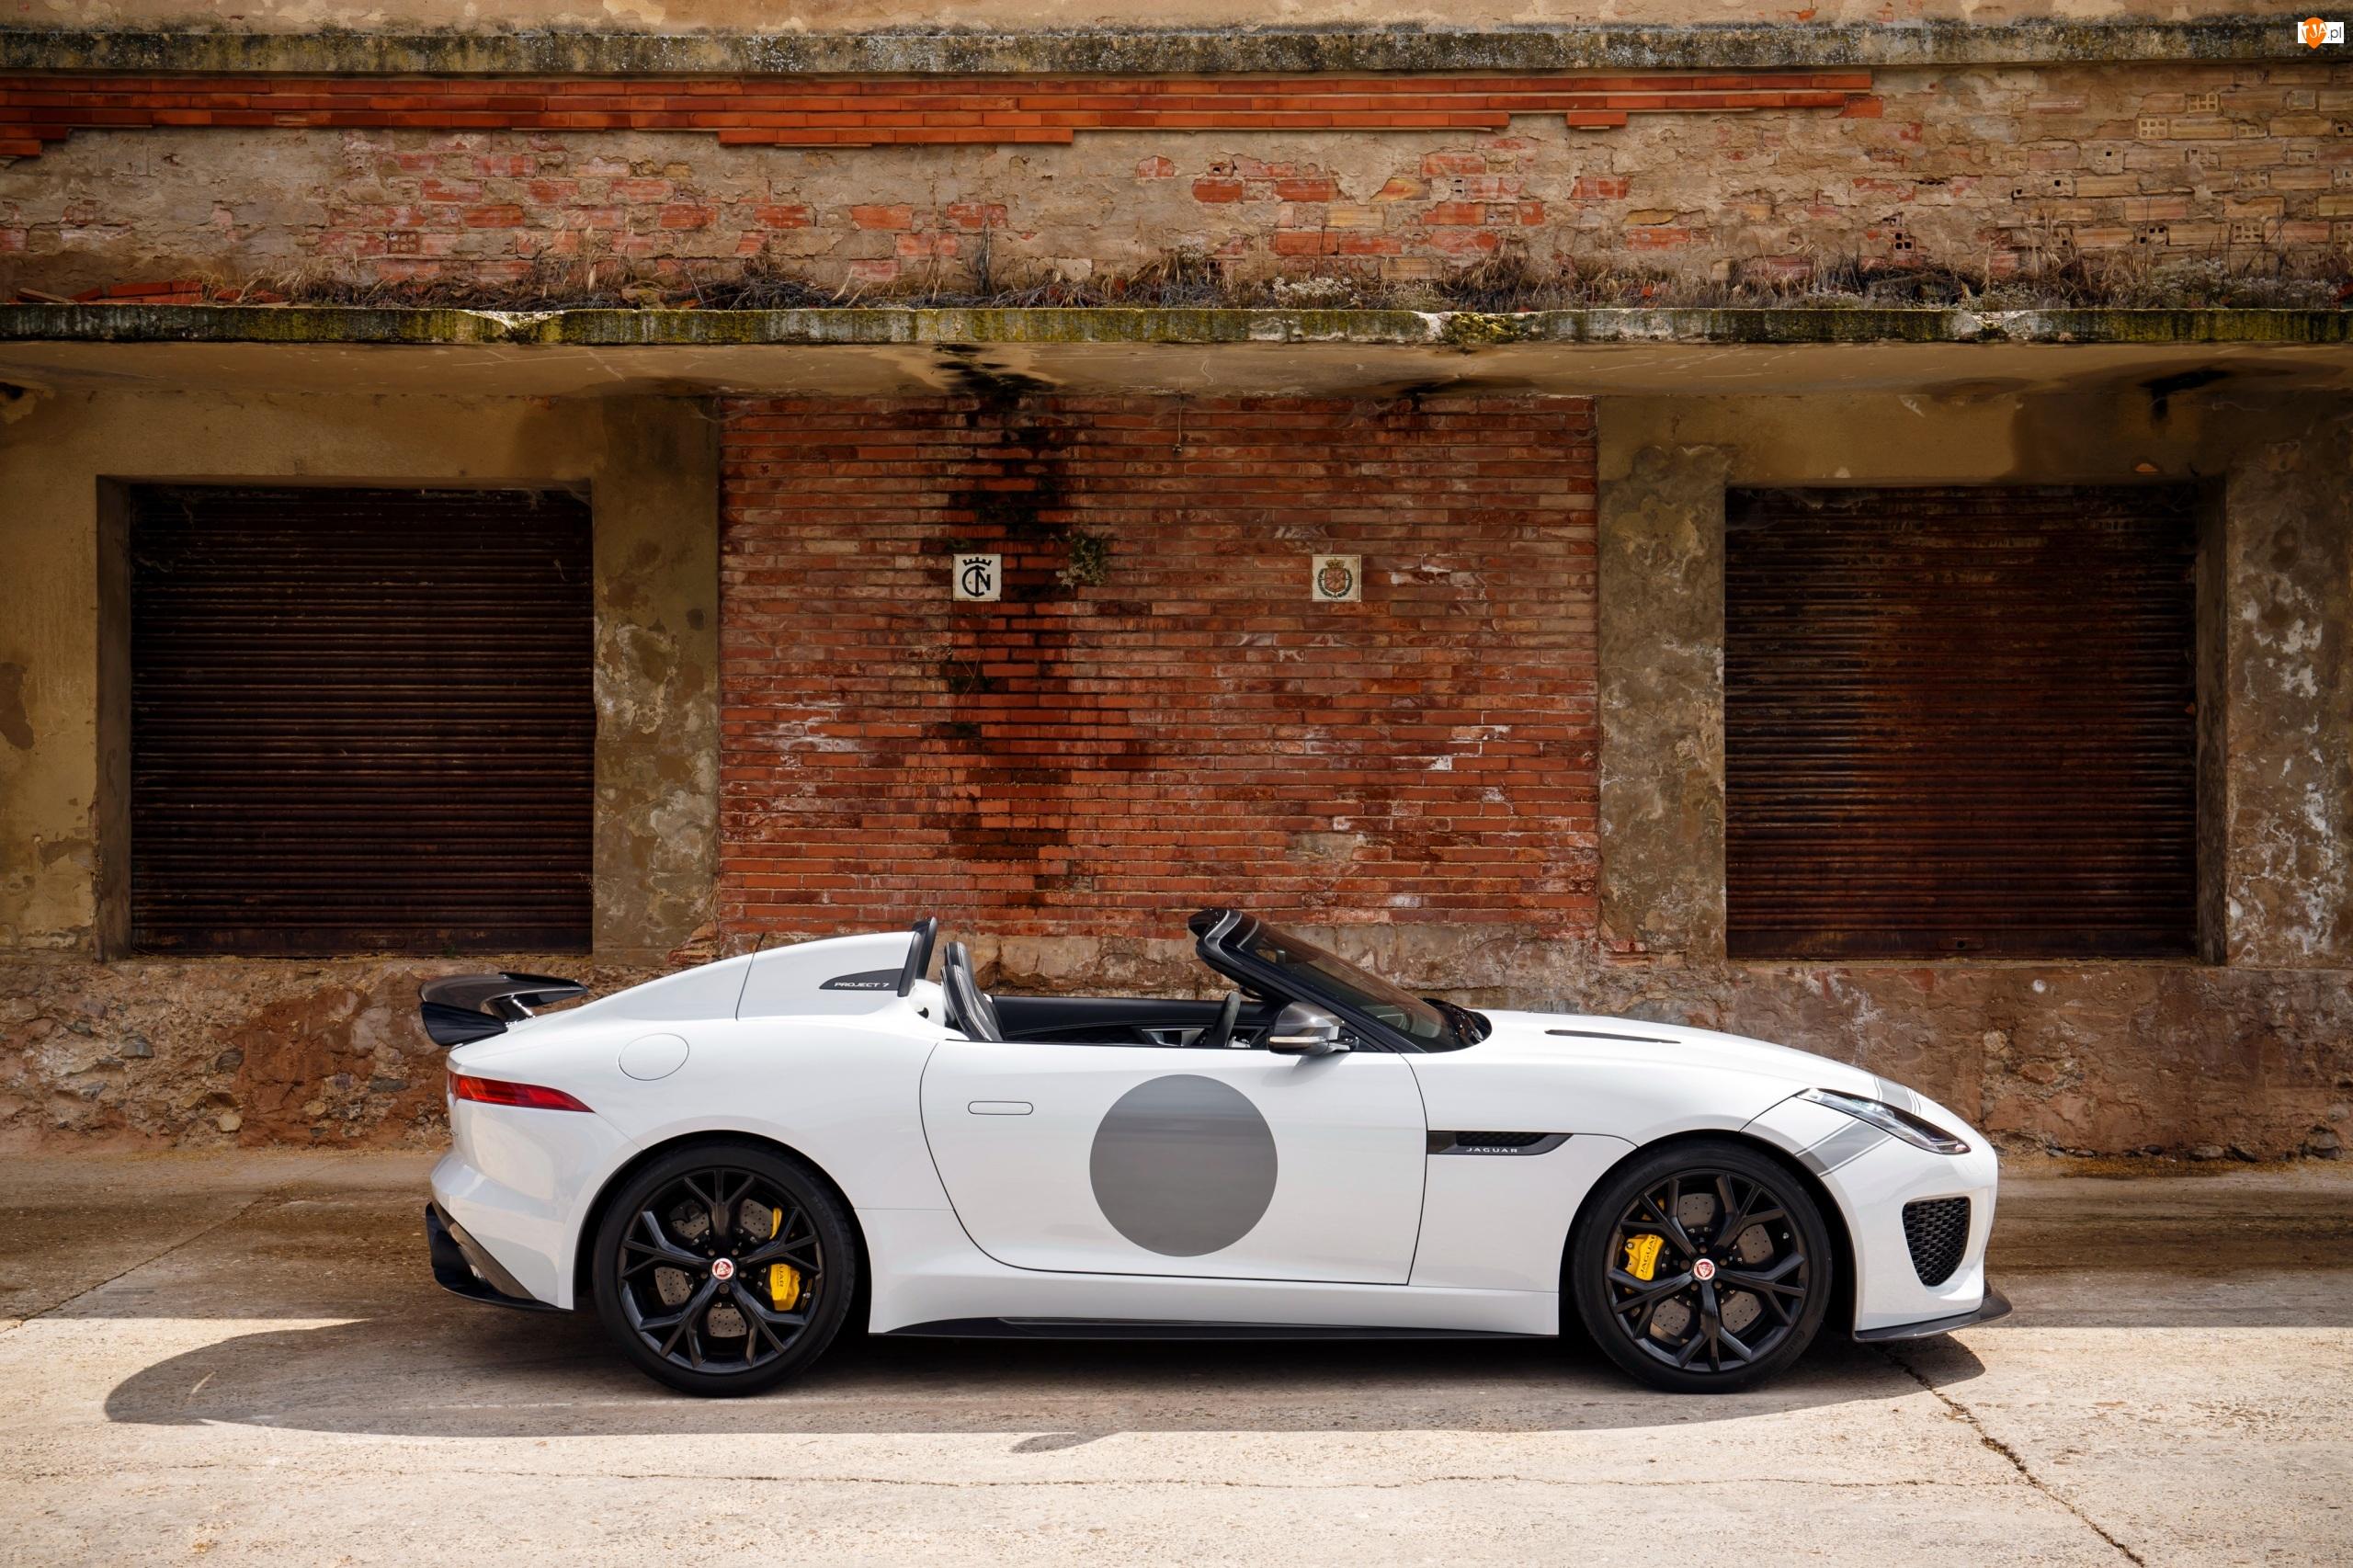 2015-2016, Biały, Jaguar F-Type Project 7